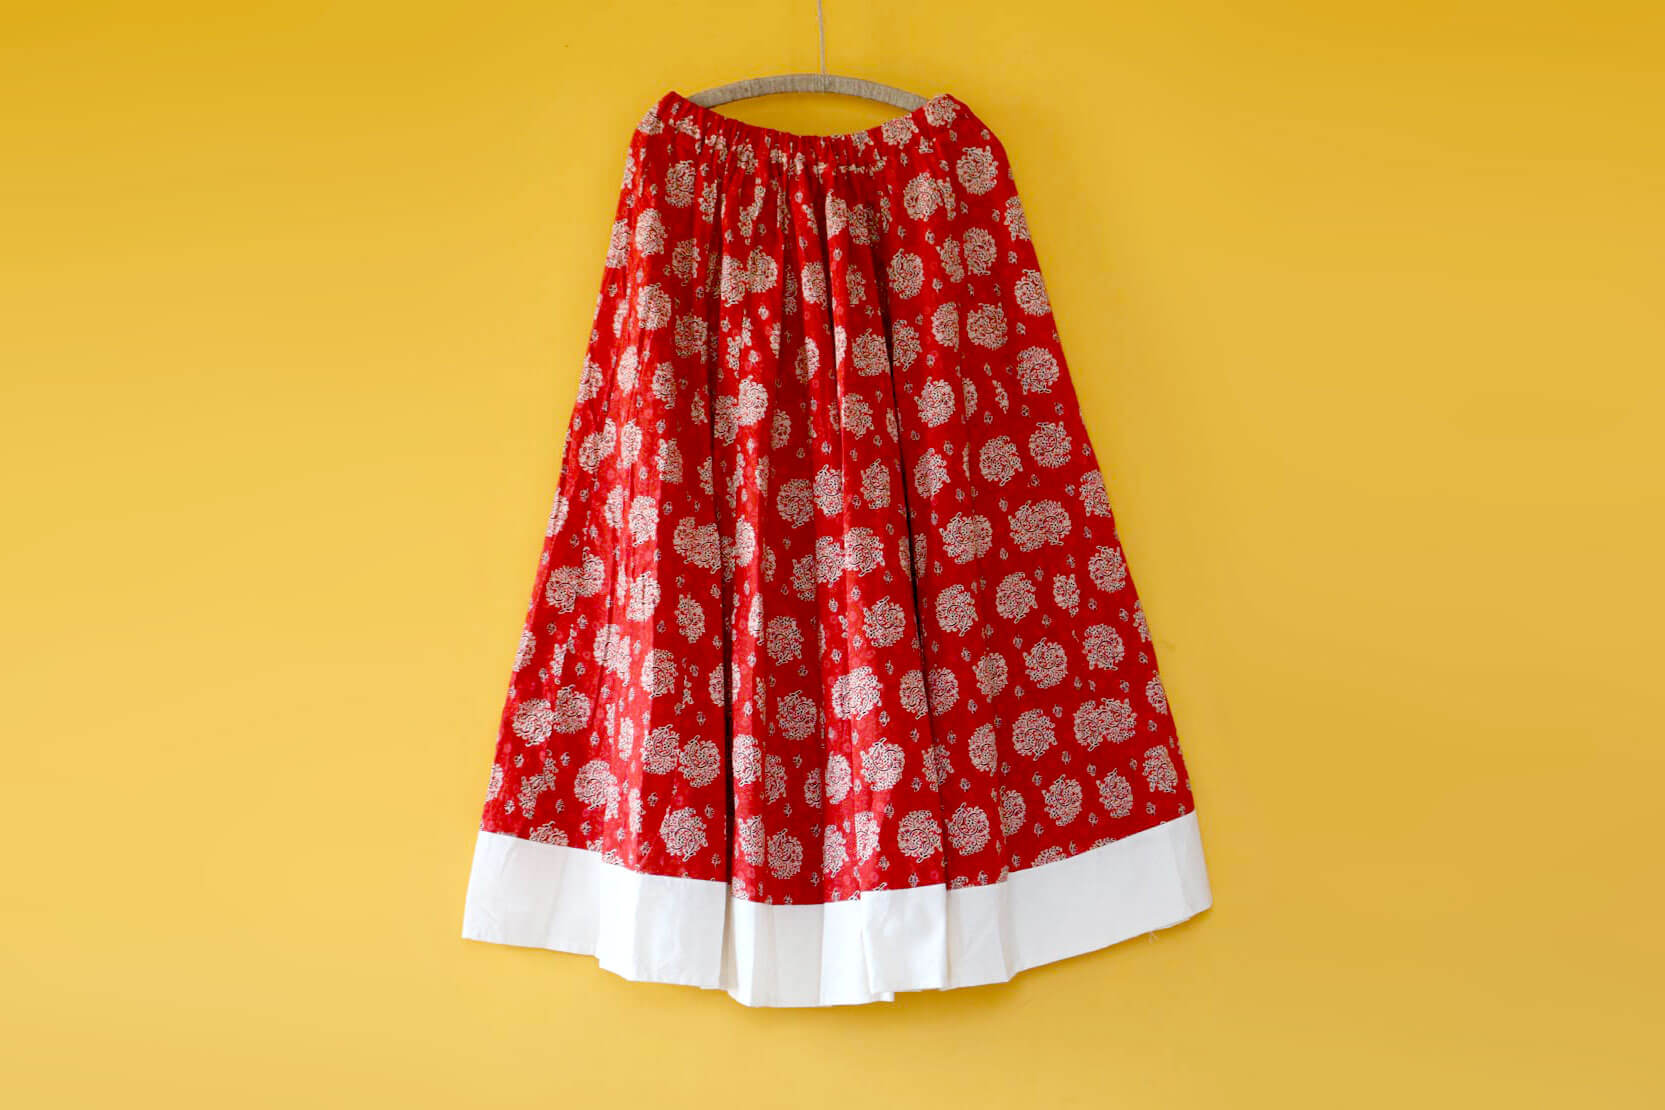 Long skirt with Rajasthani prints